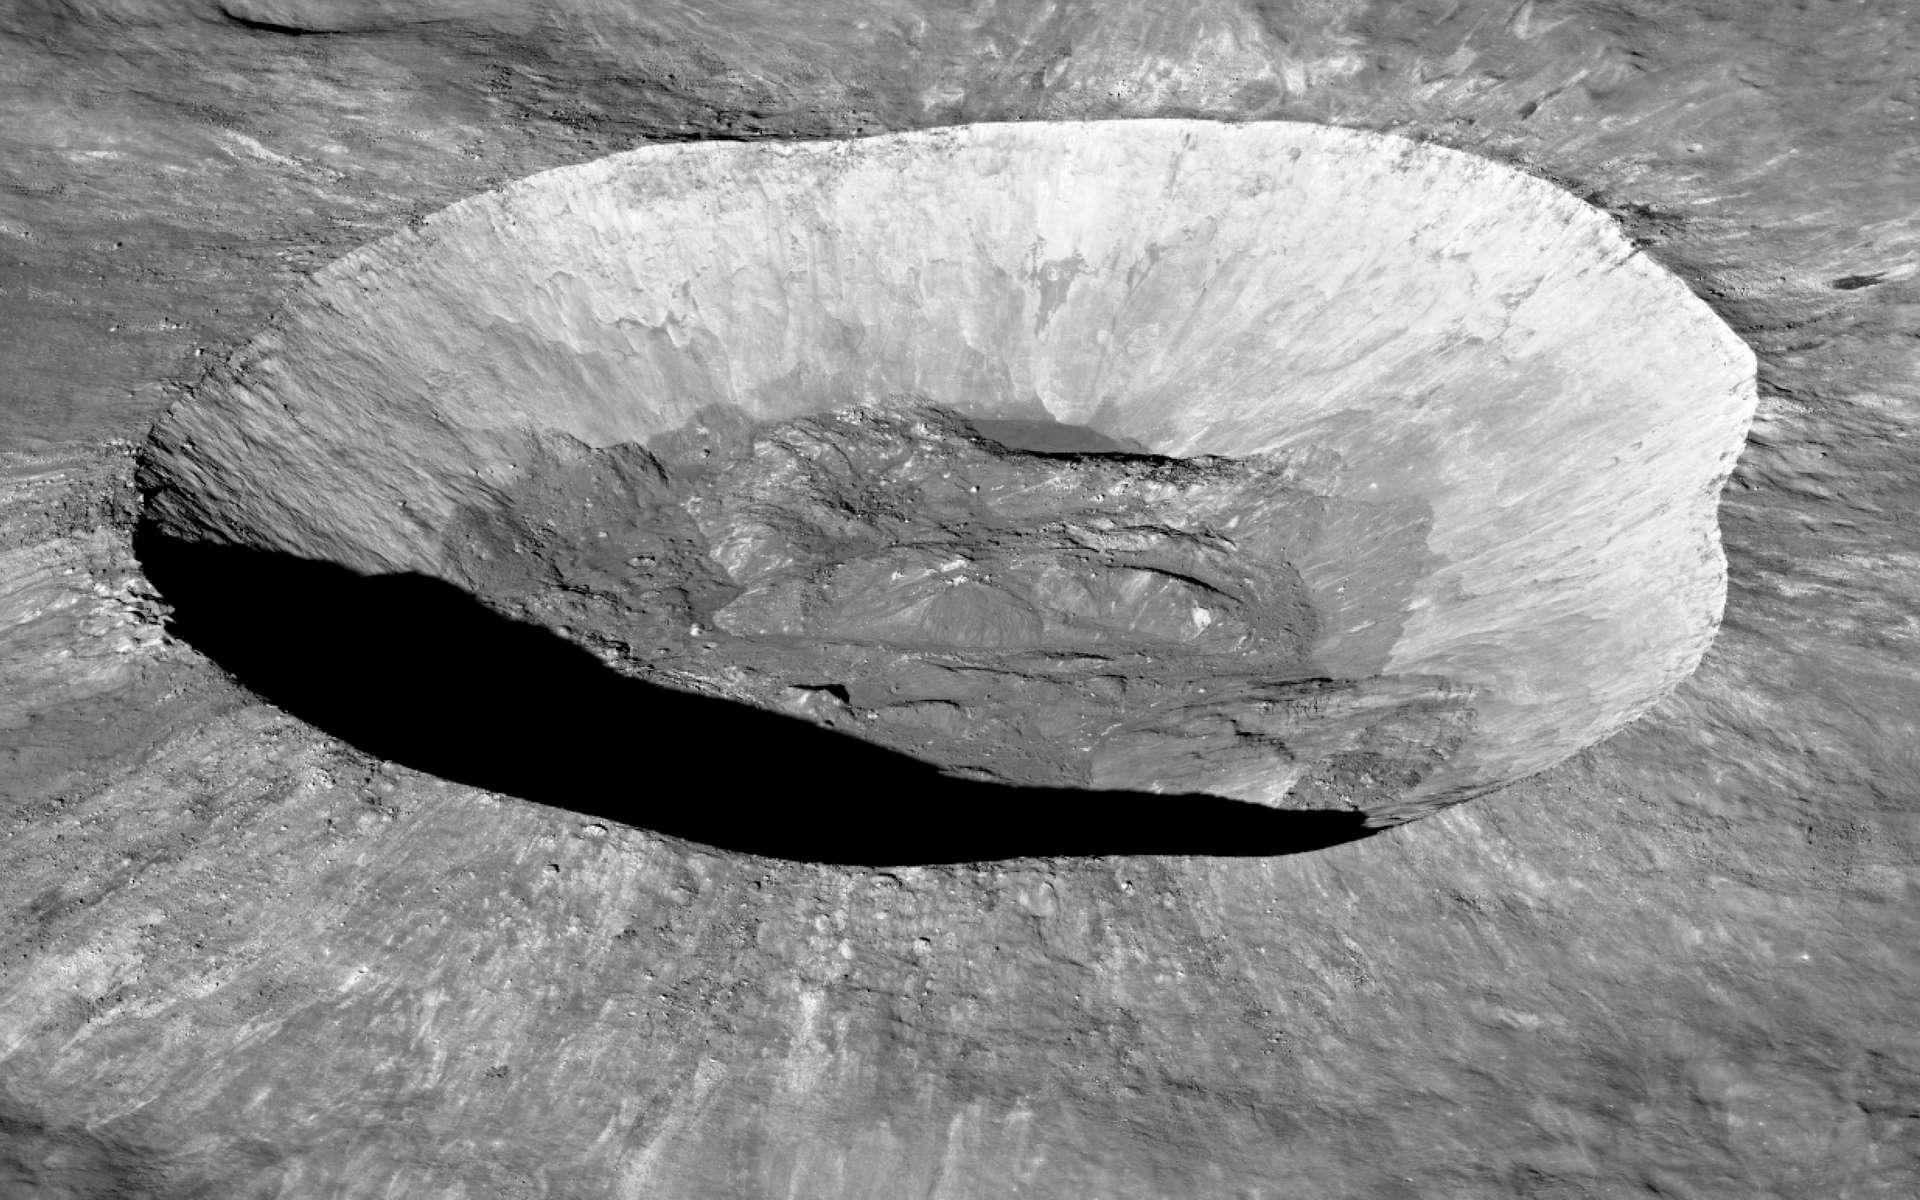 Le cratère Giordano Bruno, situé sur la face cachée de la Lune. © Nasa, Goddard, Arizona State University